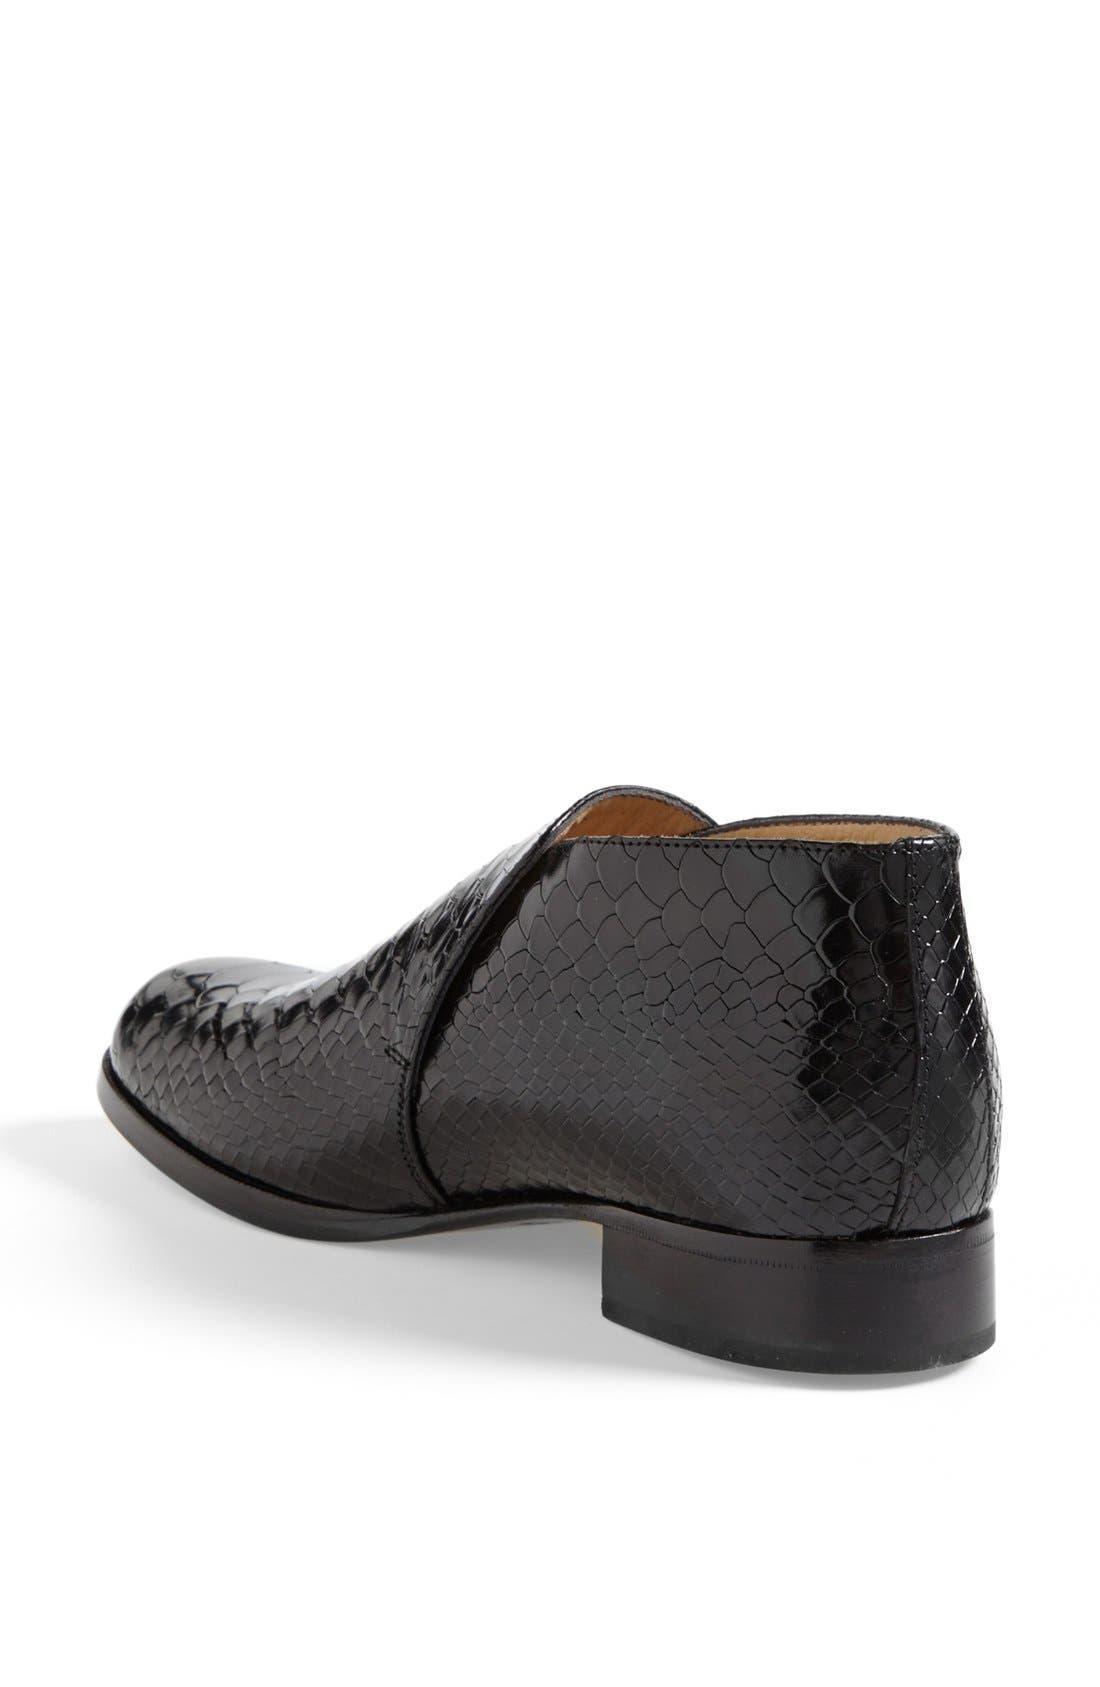 Alternate Image 2  - Kurt Geiger London 'Loafer' Boot